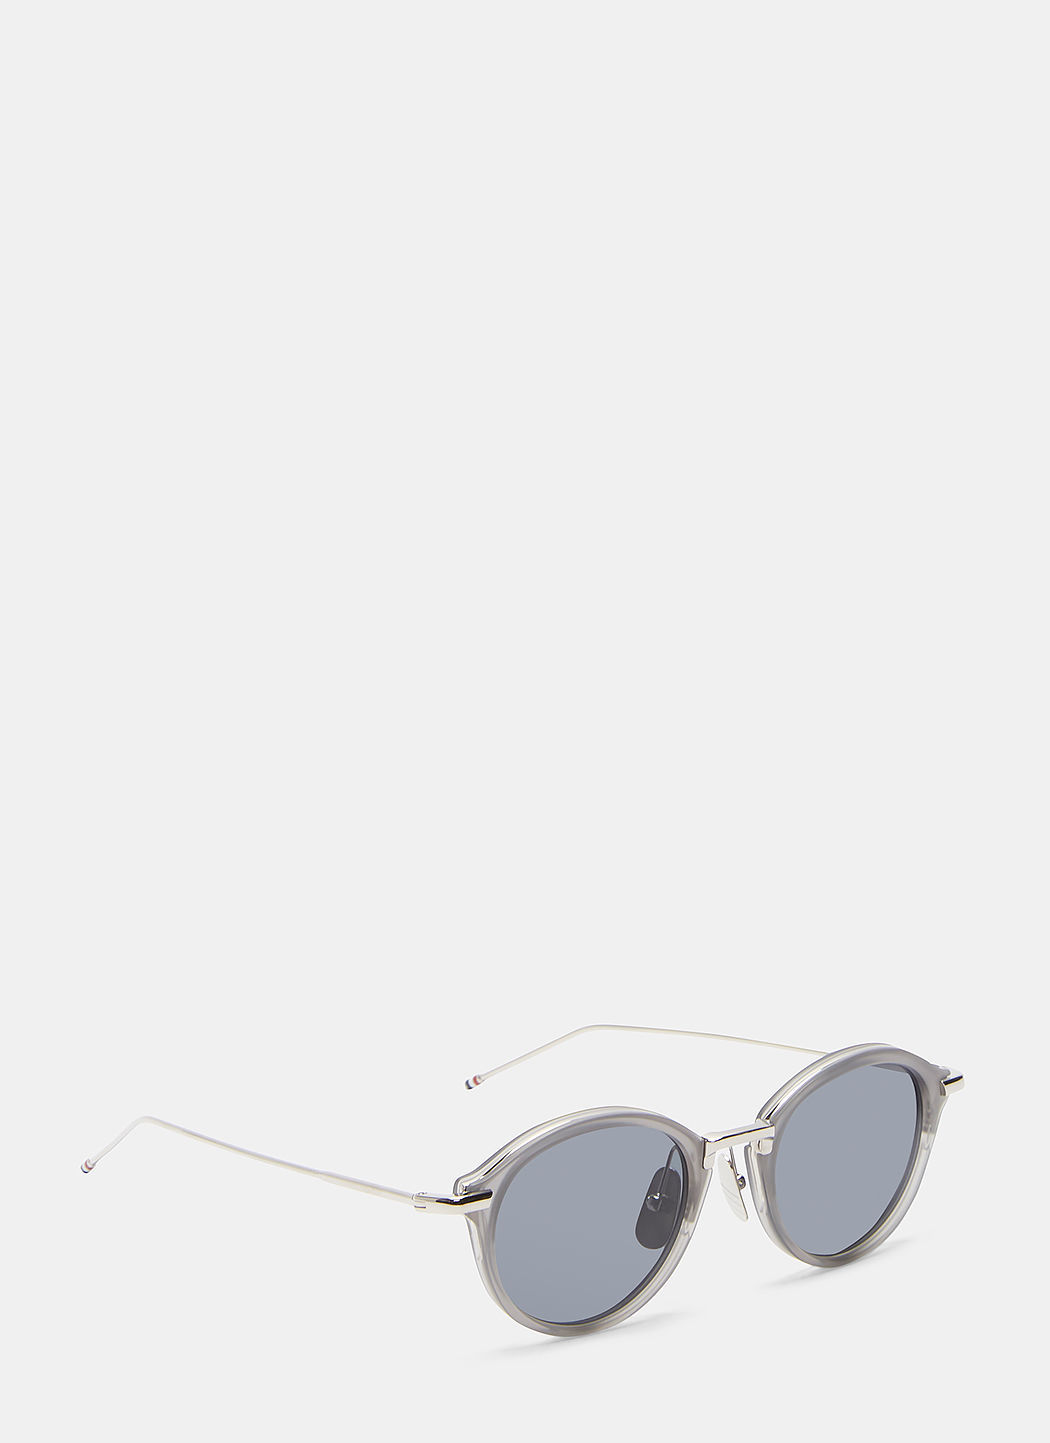 Thom Browne Men's Round Sunglasses In Grey